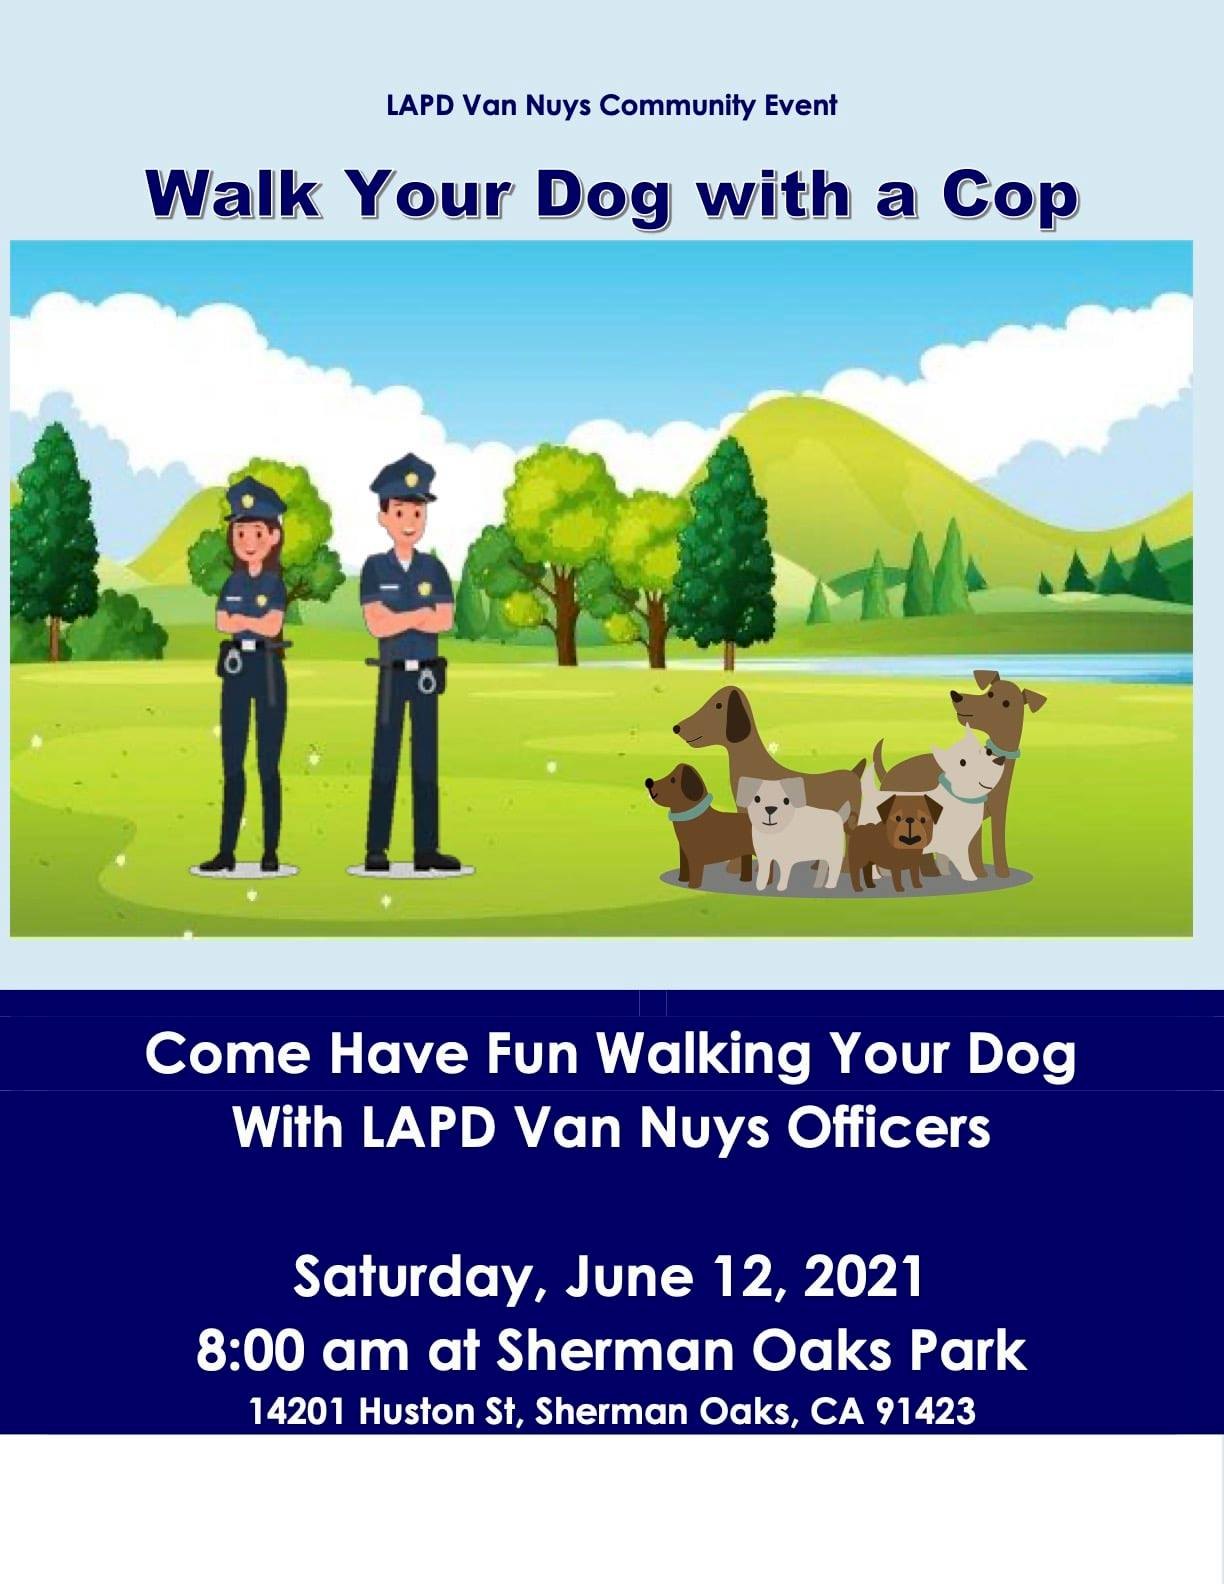 walk dog with cop